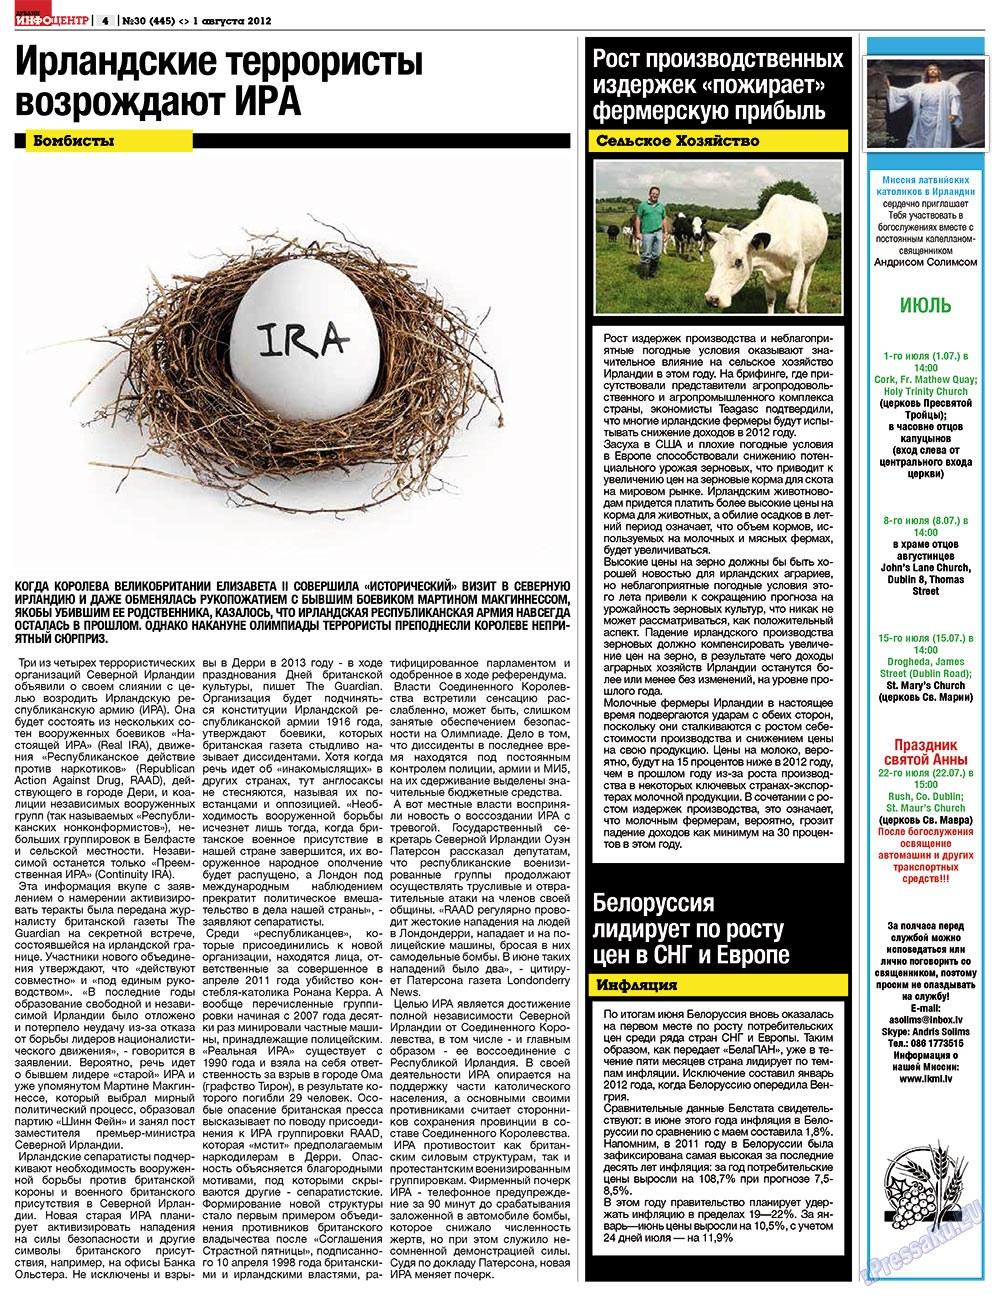 Дублин инфоцентр (газета). 2012 год, номер 30, стр. 4